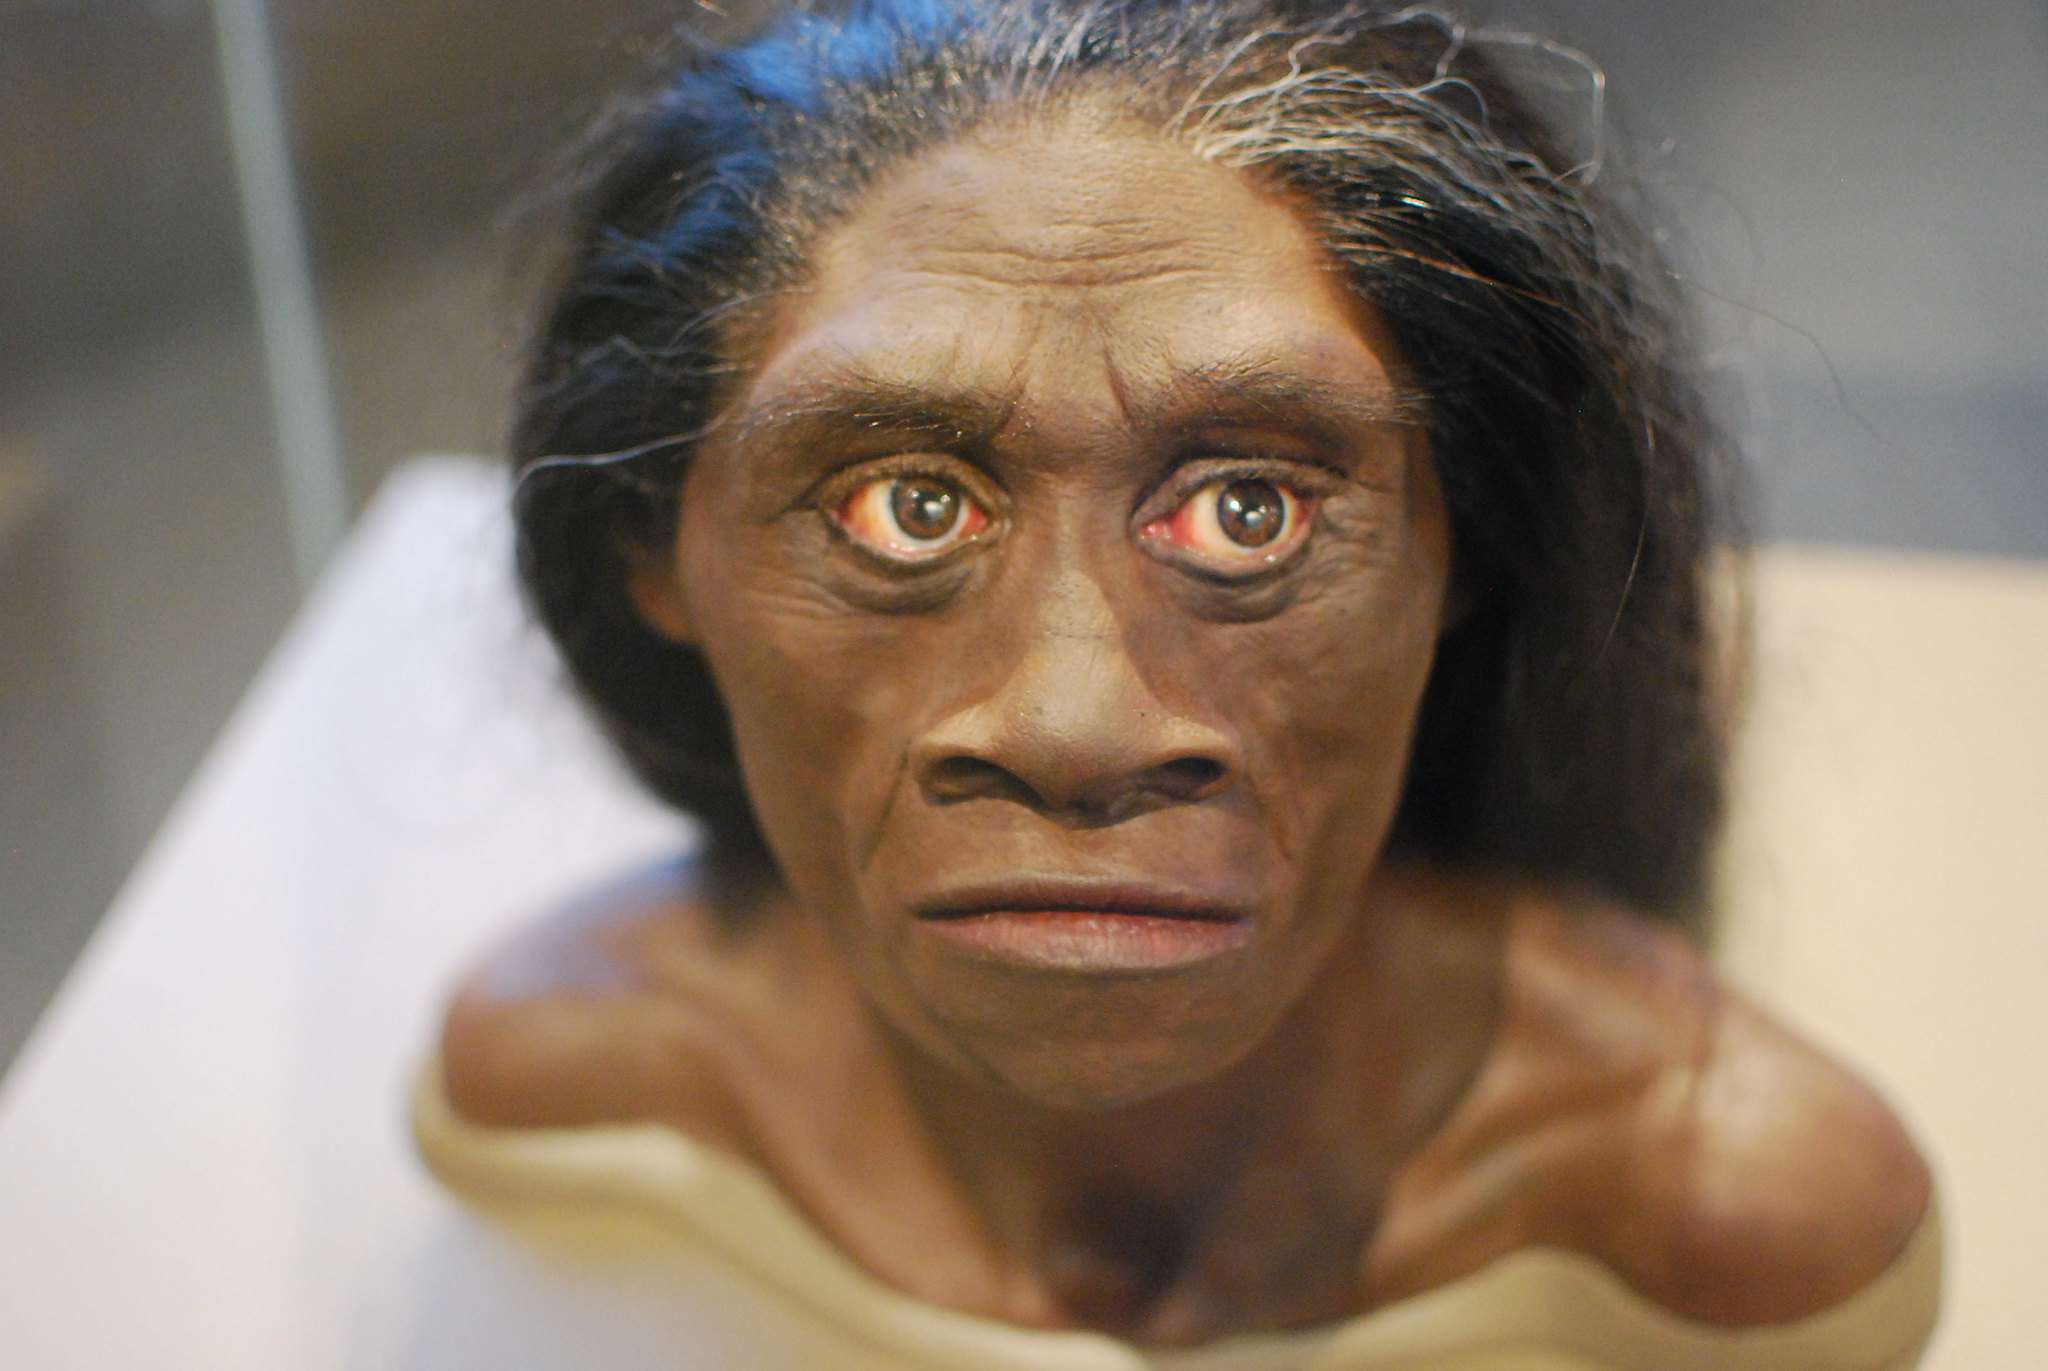 bust of hobbit with dark skin, flat nose, large eyes